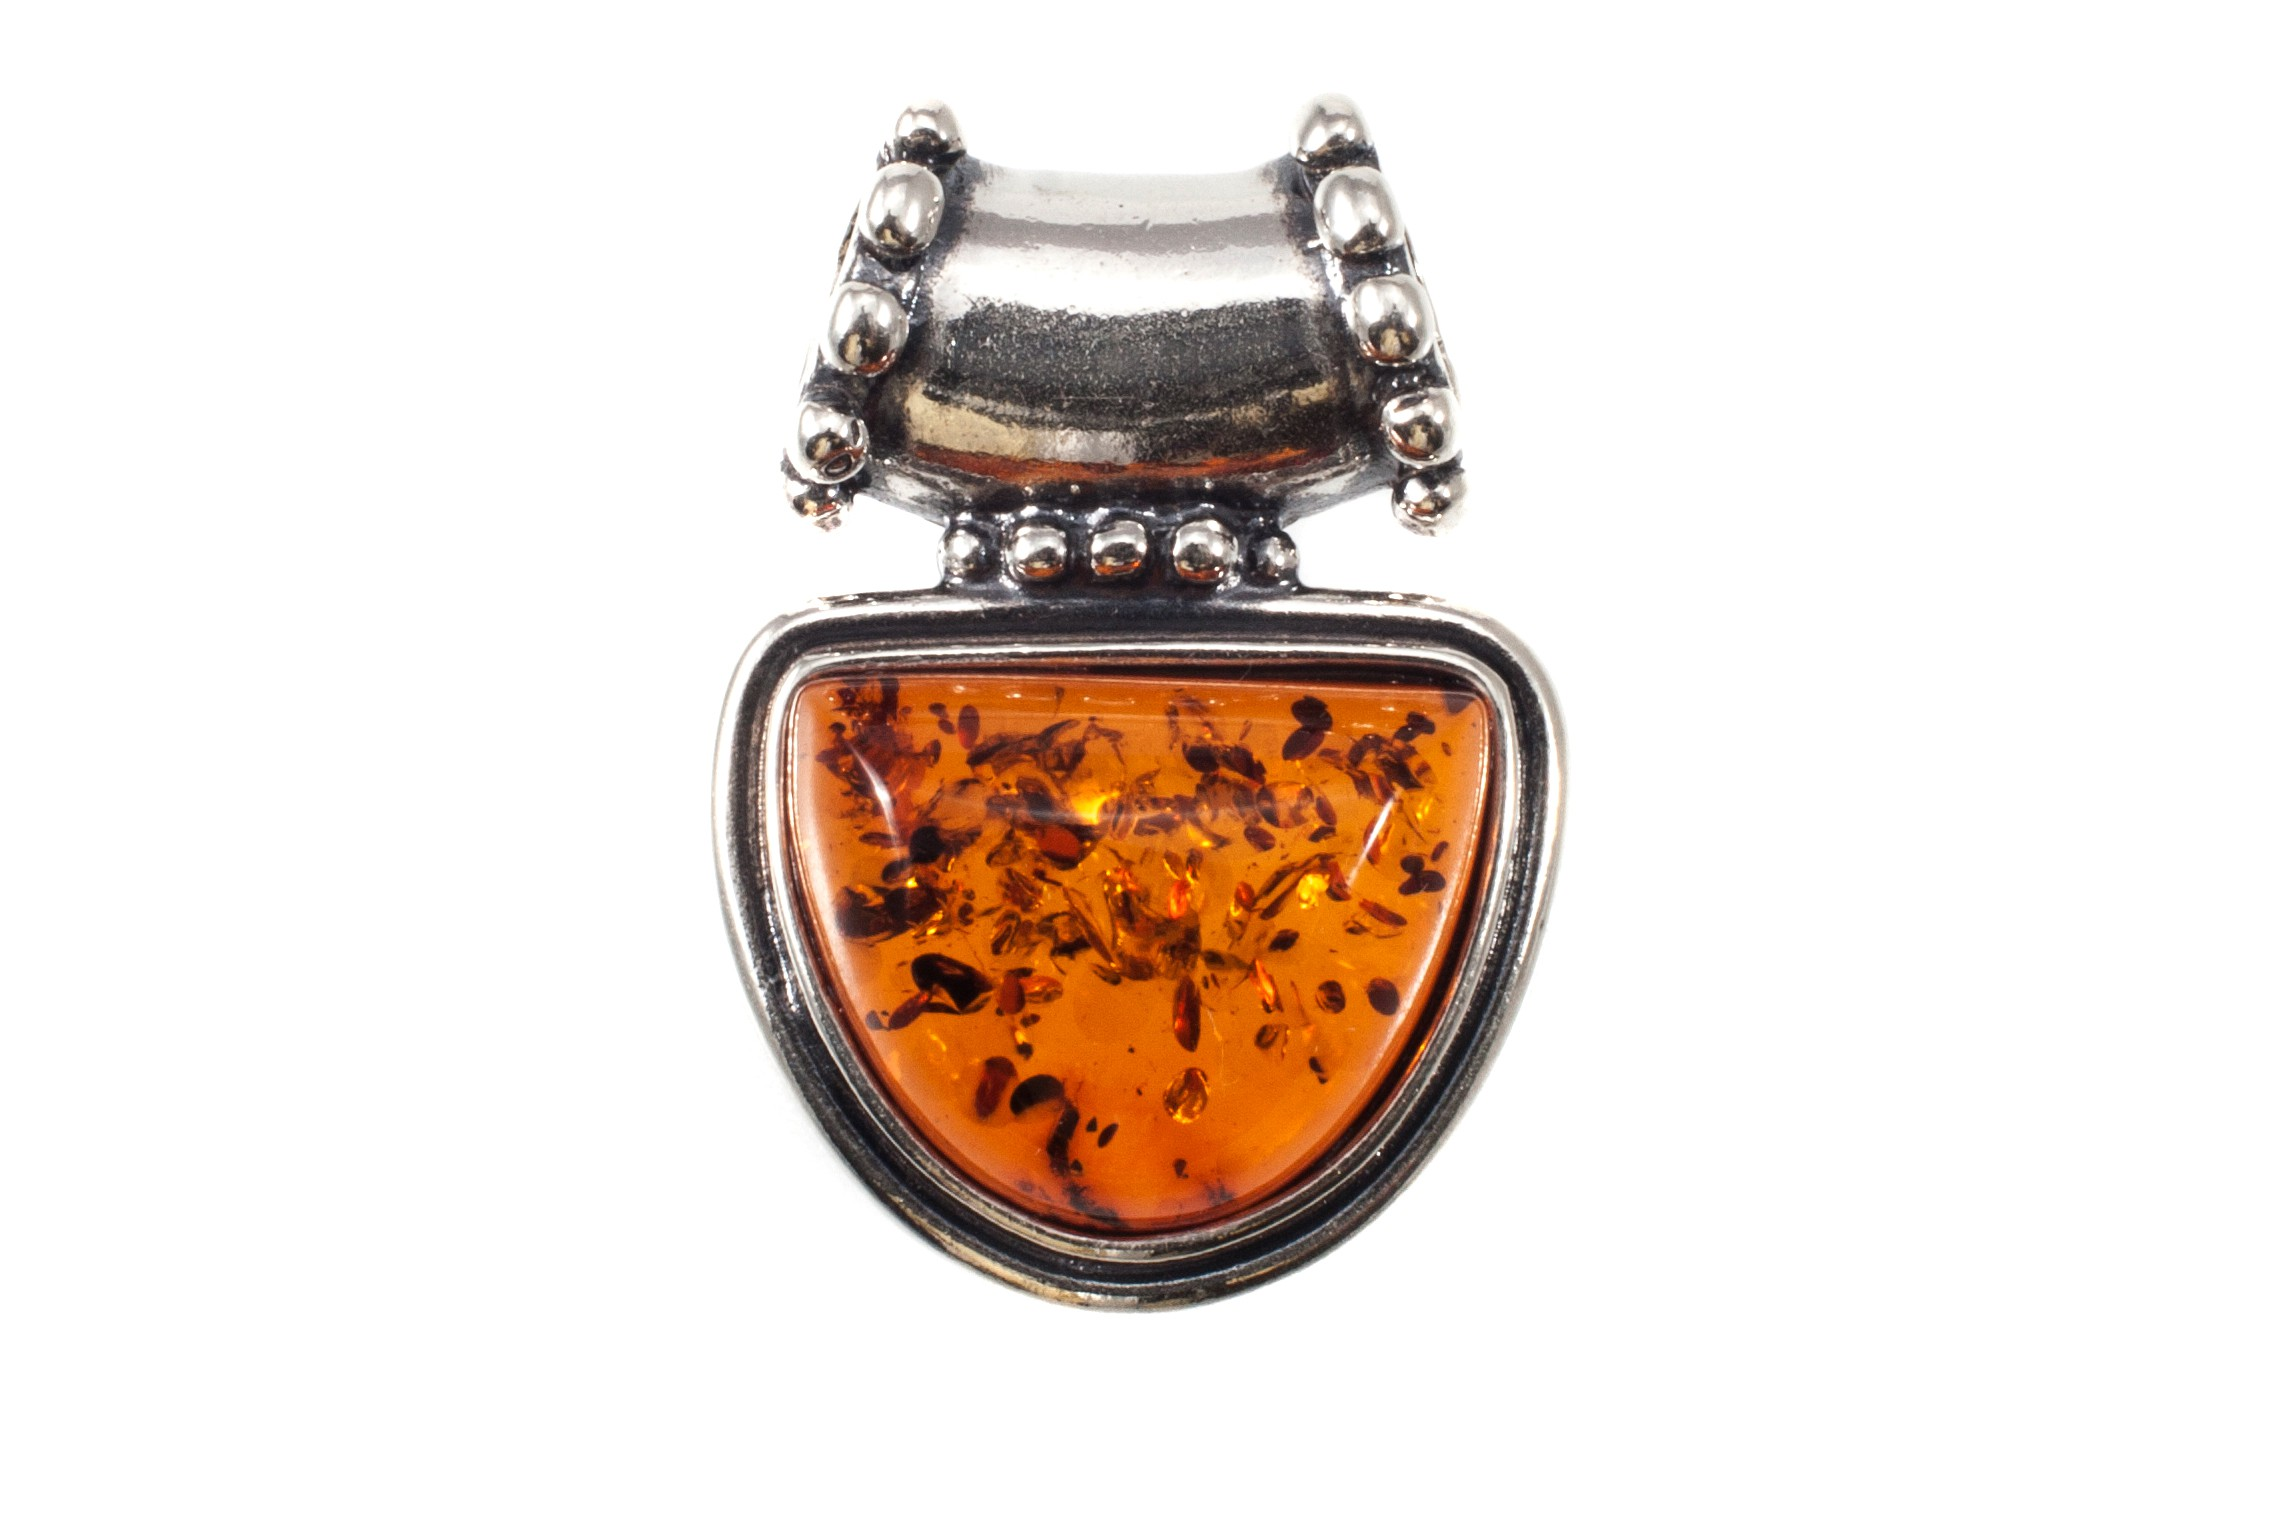 58*78mm,big Baltic amber pendant,amber silver pendant,amber pendant,amber,silver,white,milky,pendant,pendants,Baltic,gem,flower,big,gems